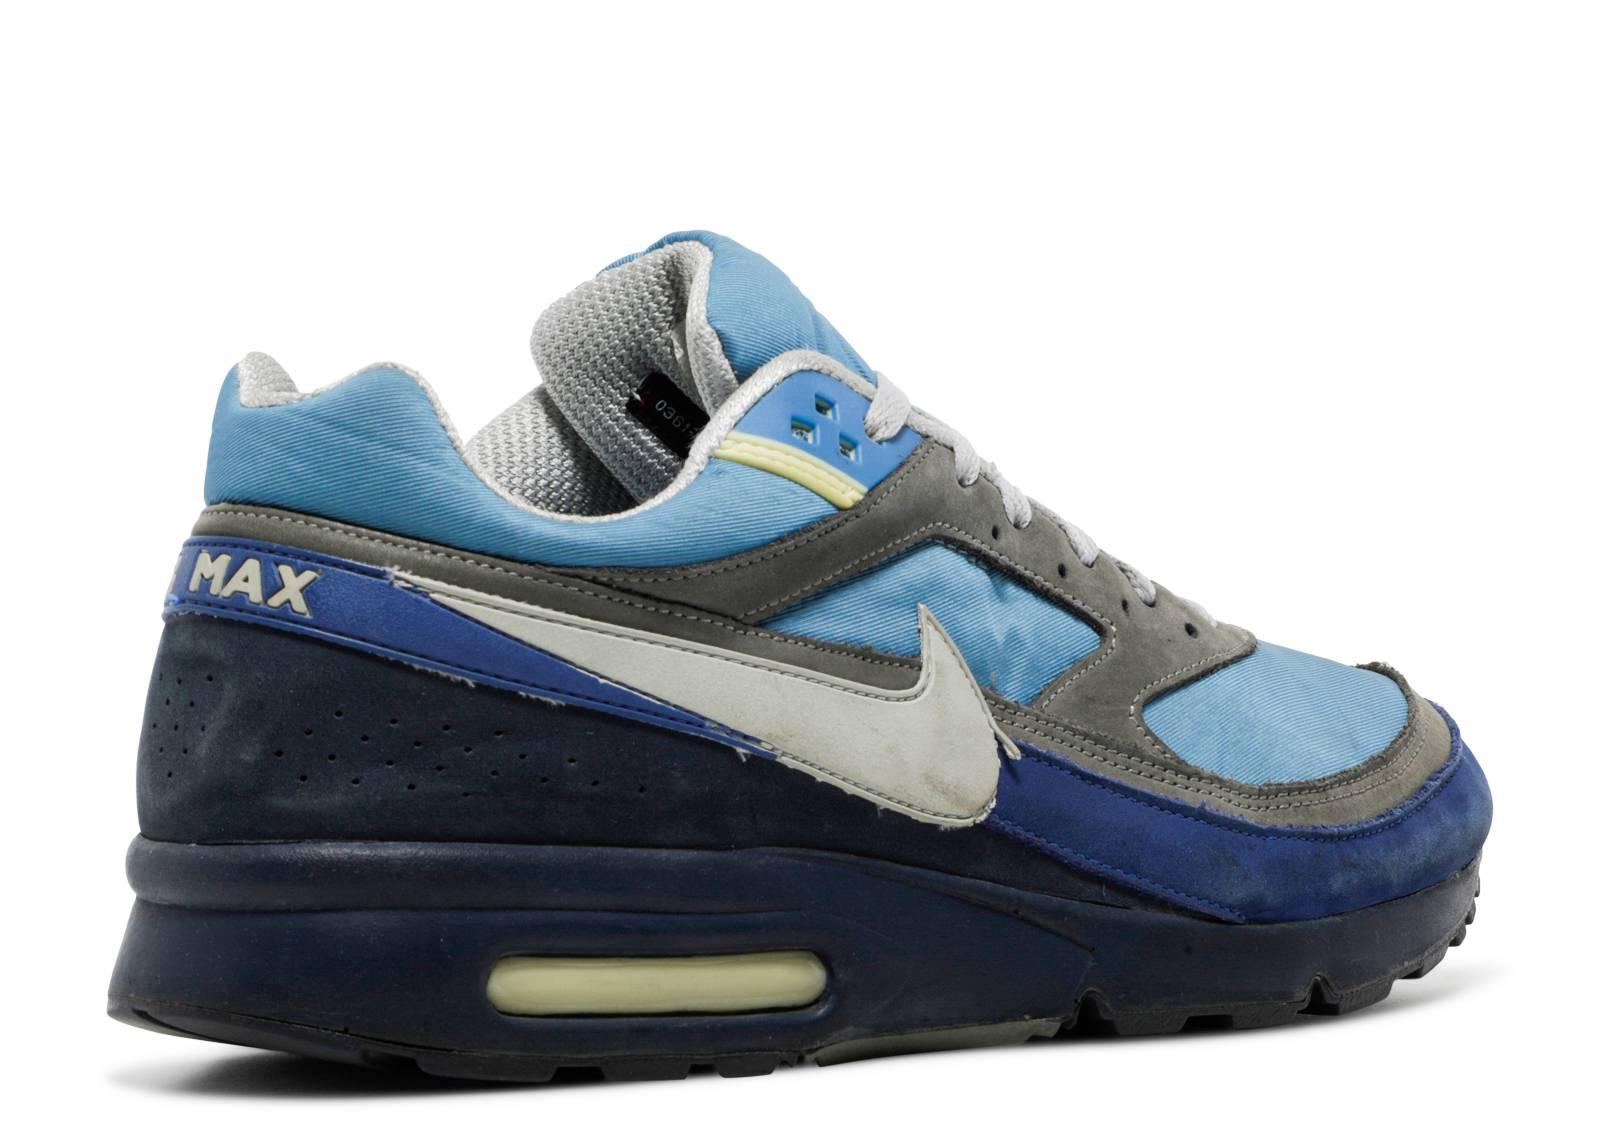 NIKE AIR MAX CLASSIC BW ST STASH ARTIST SERIES 1 ROYAL BLUE GREY 307253 401 12